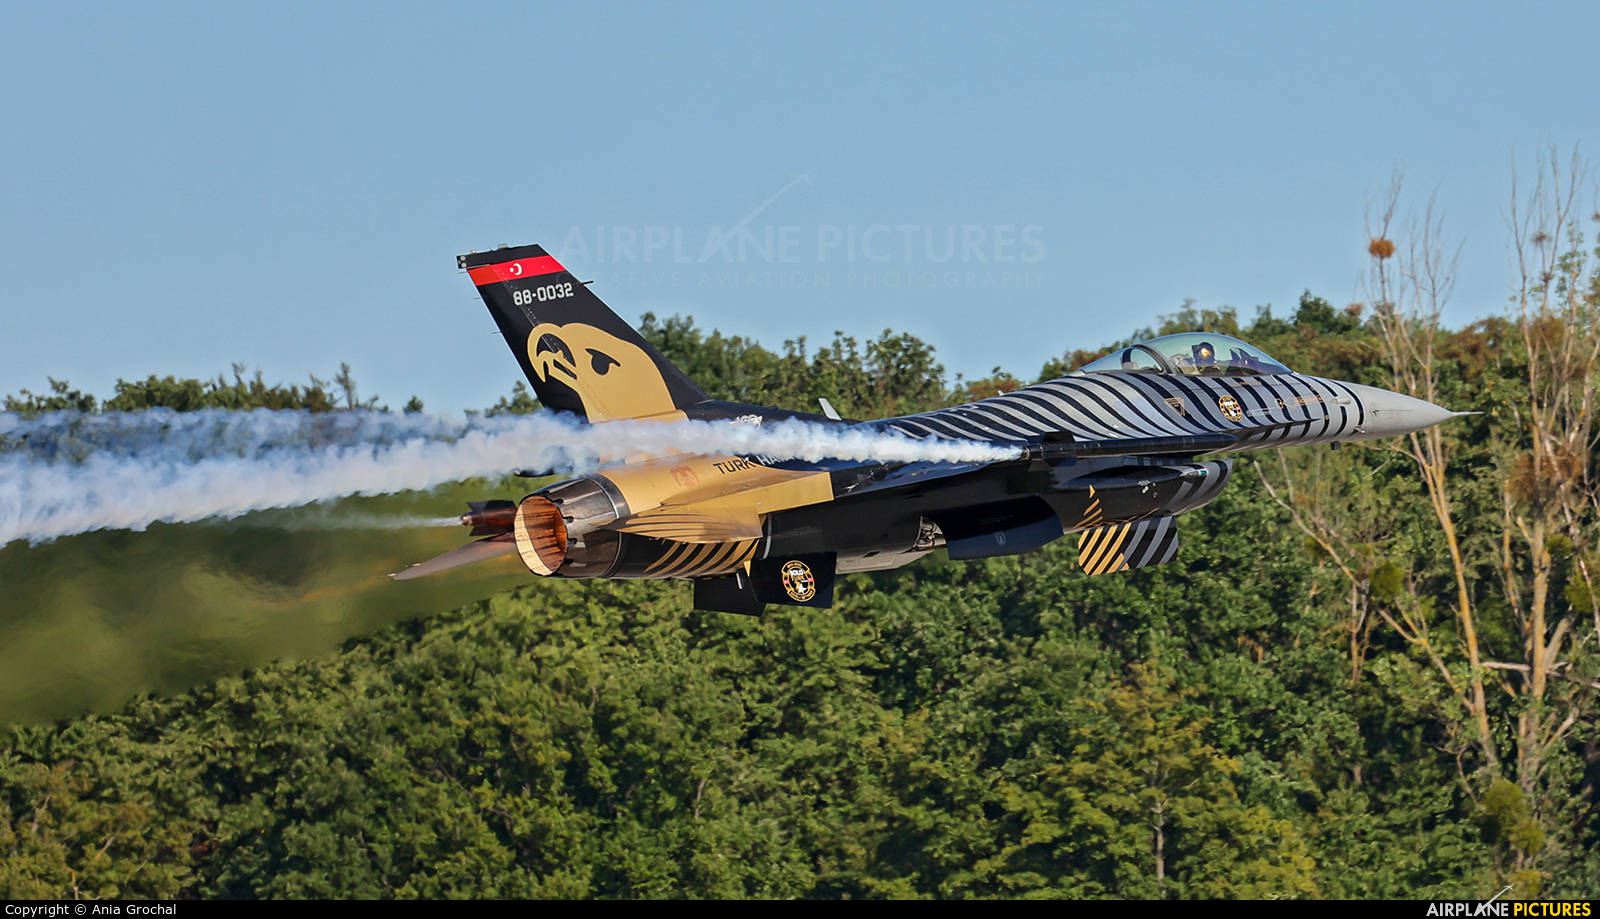 Turkey - Air Force 88-0032 aircraft at Gdynia- Babie Doły (Oksywie)